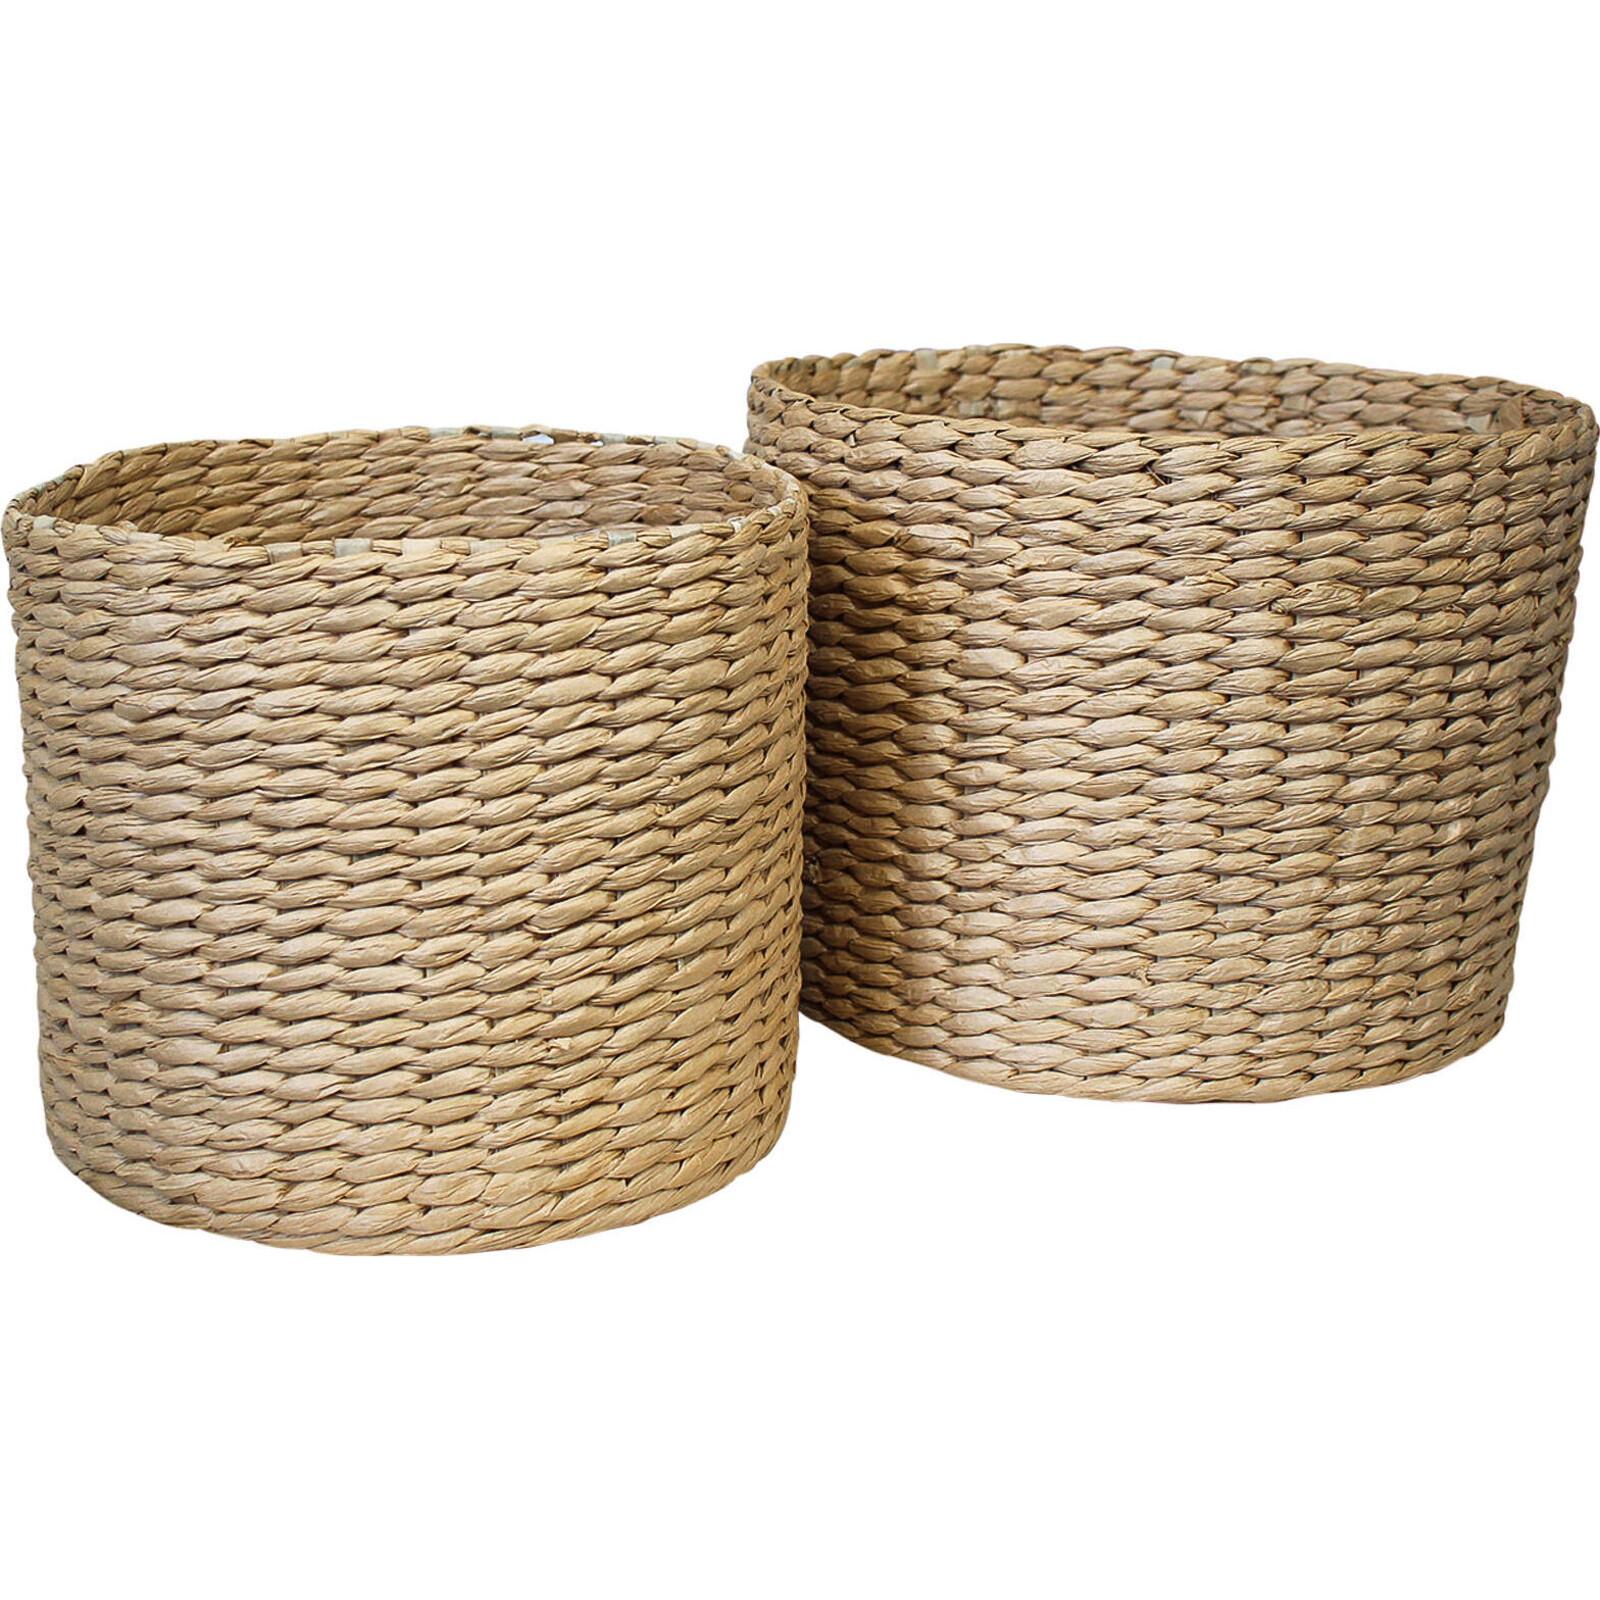 Basket Woven Tub Set/2